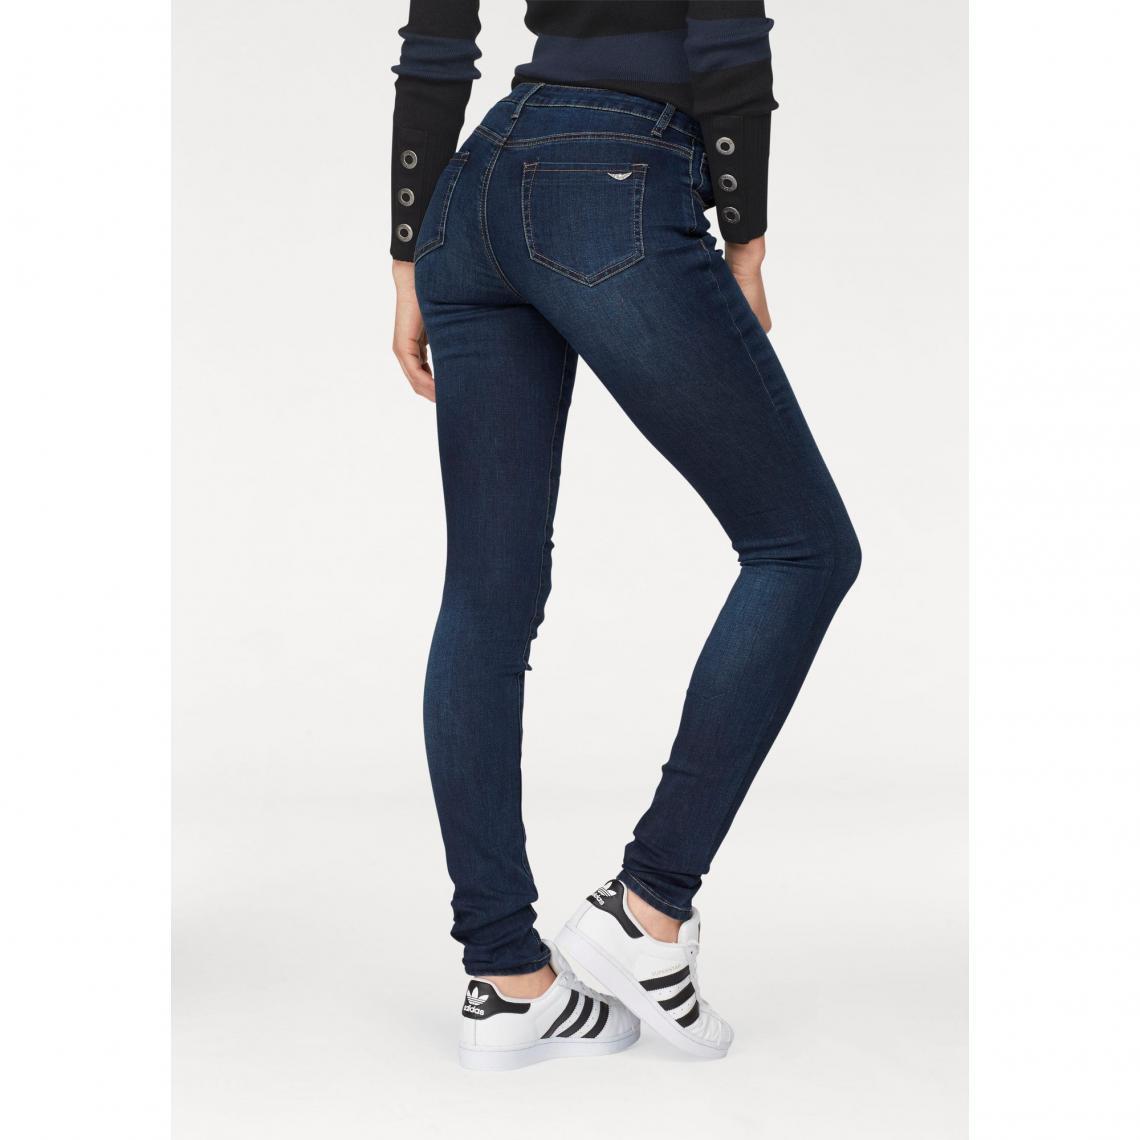 b098317efe67 Pantalon skinny mid waist femme Arizona - Bleu Foncé Used